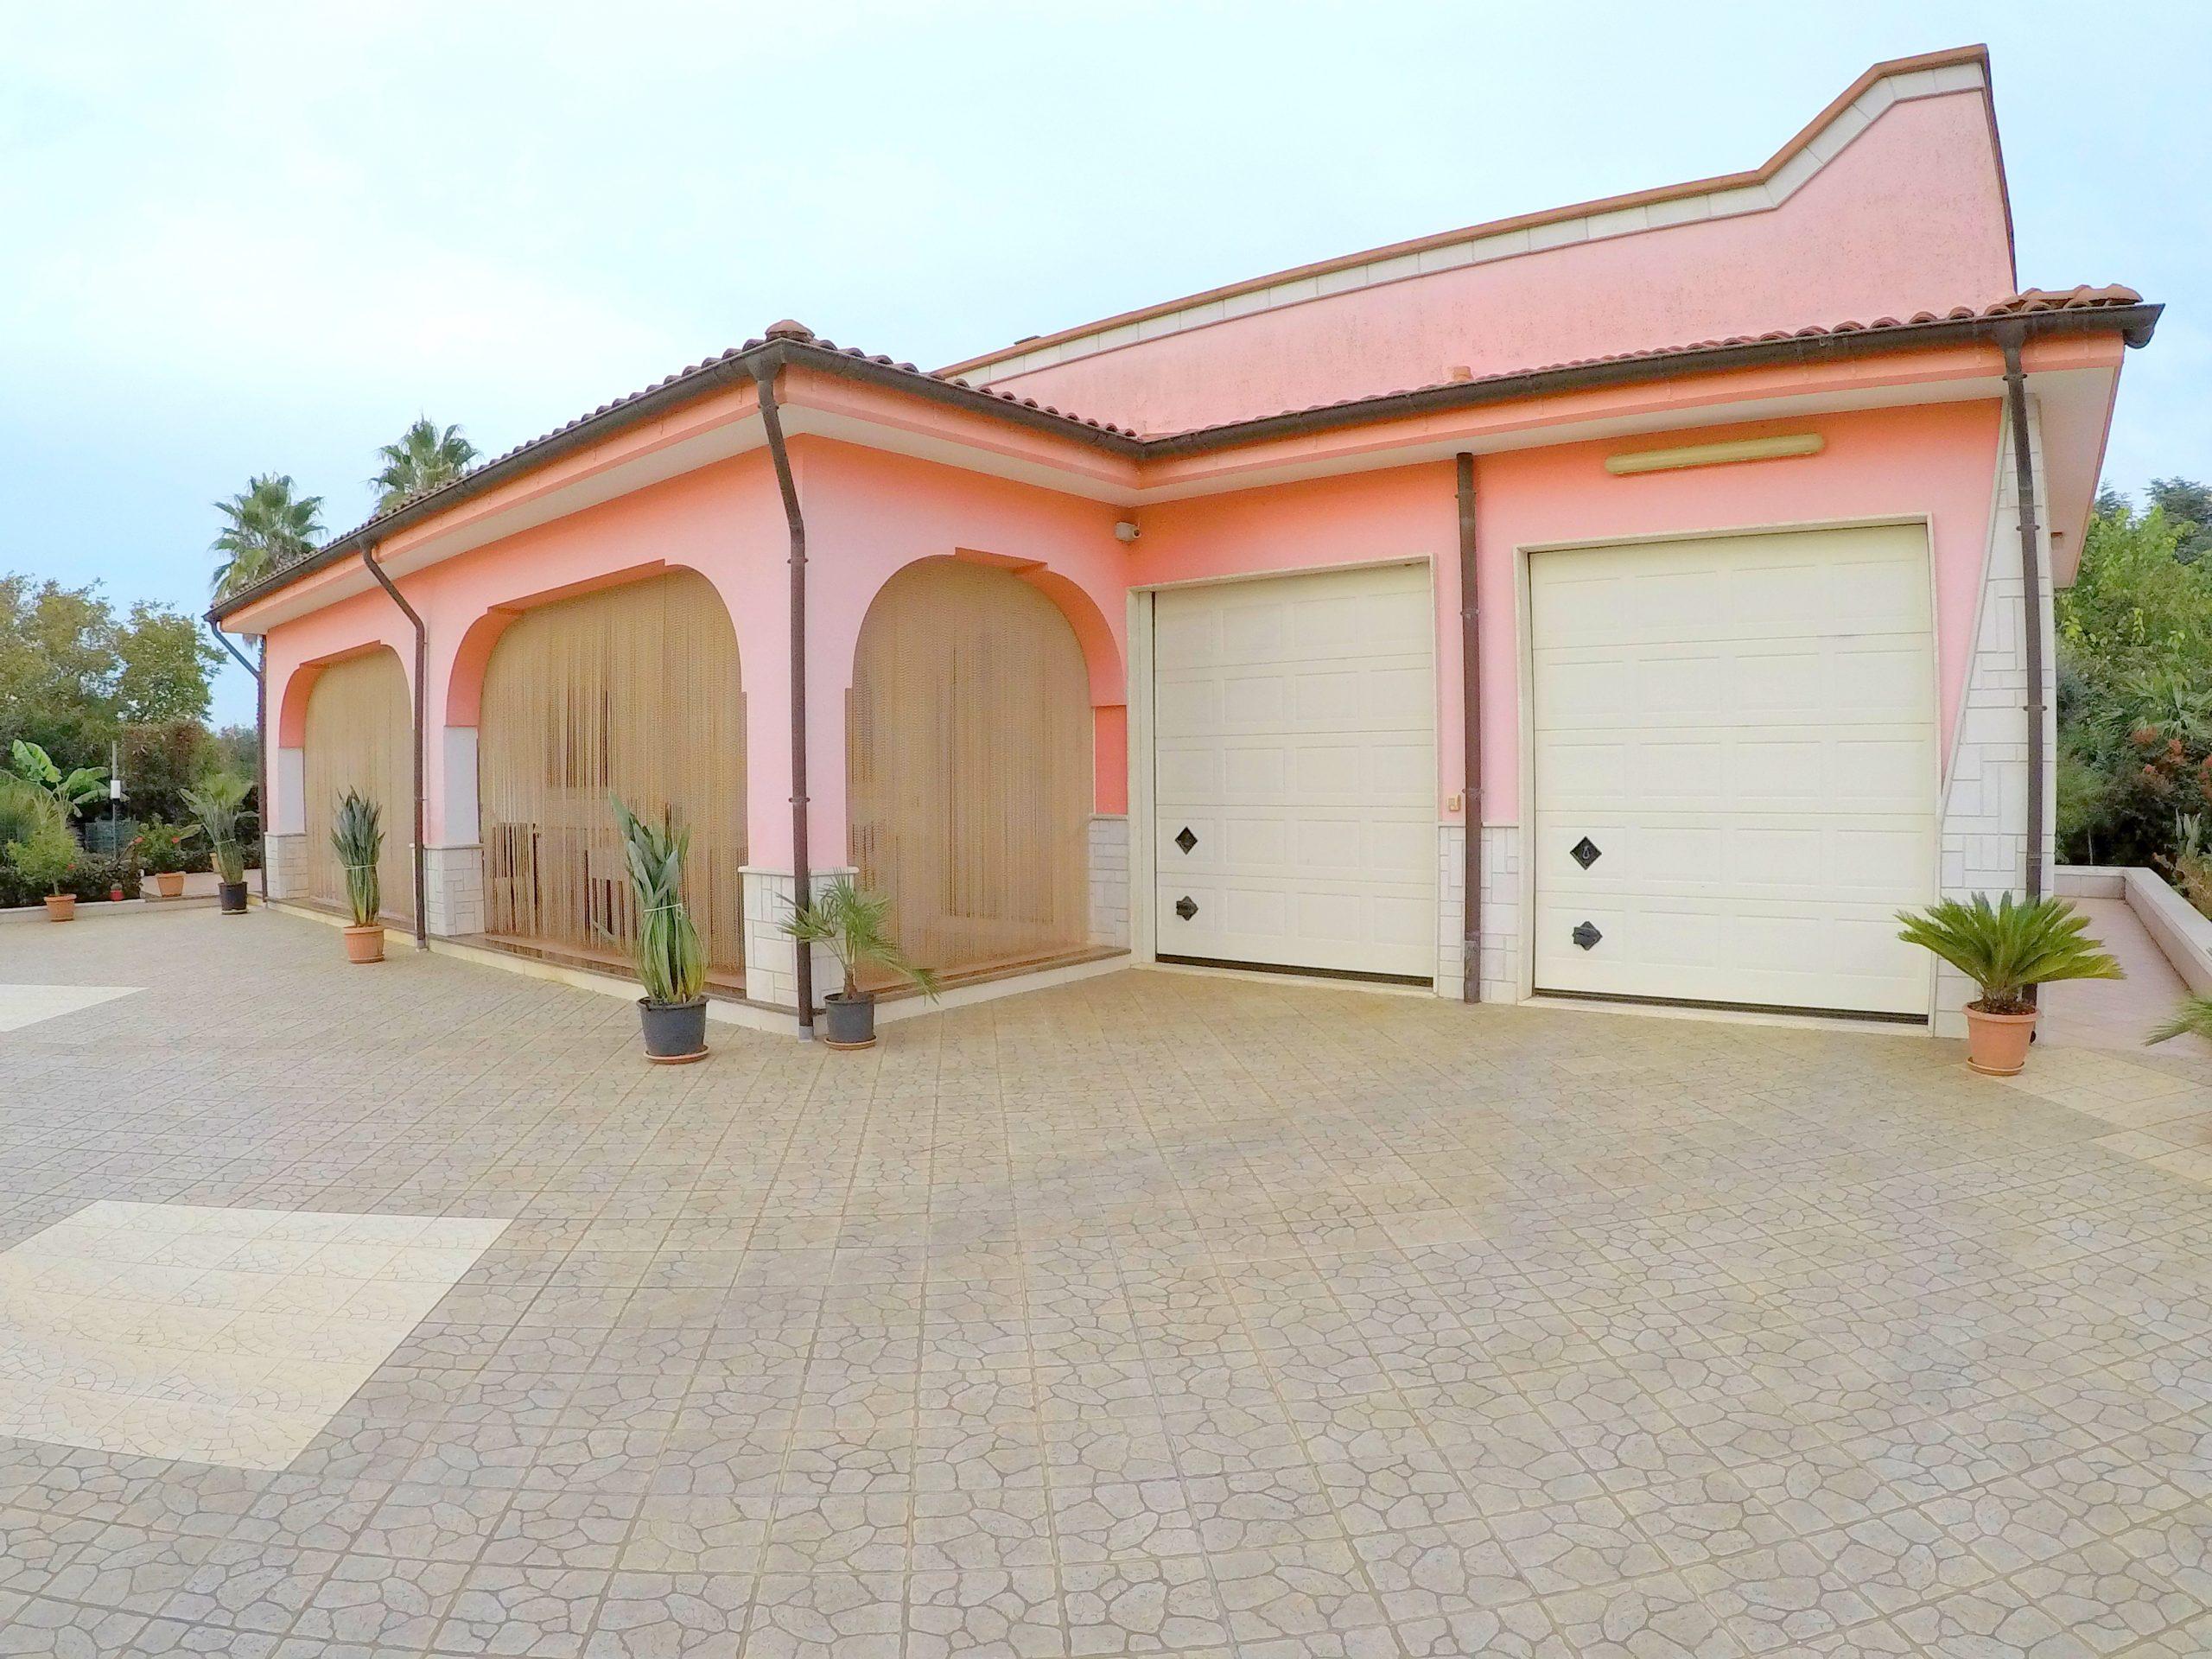 Villa in zona residenziale – Rif. 049